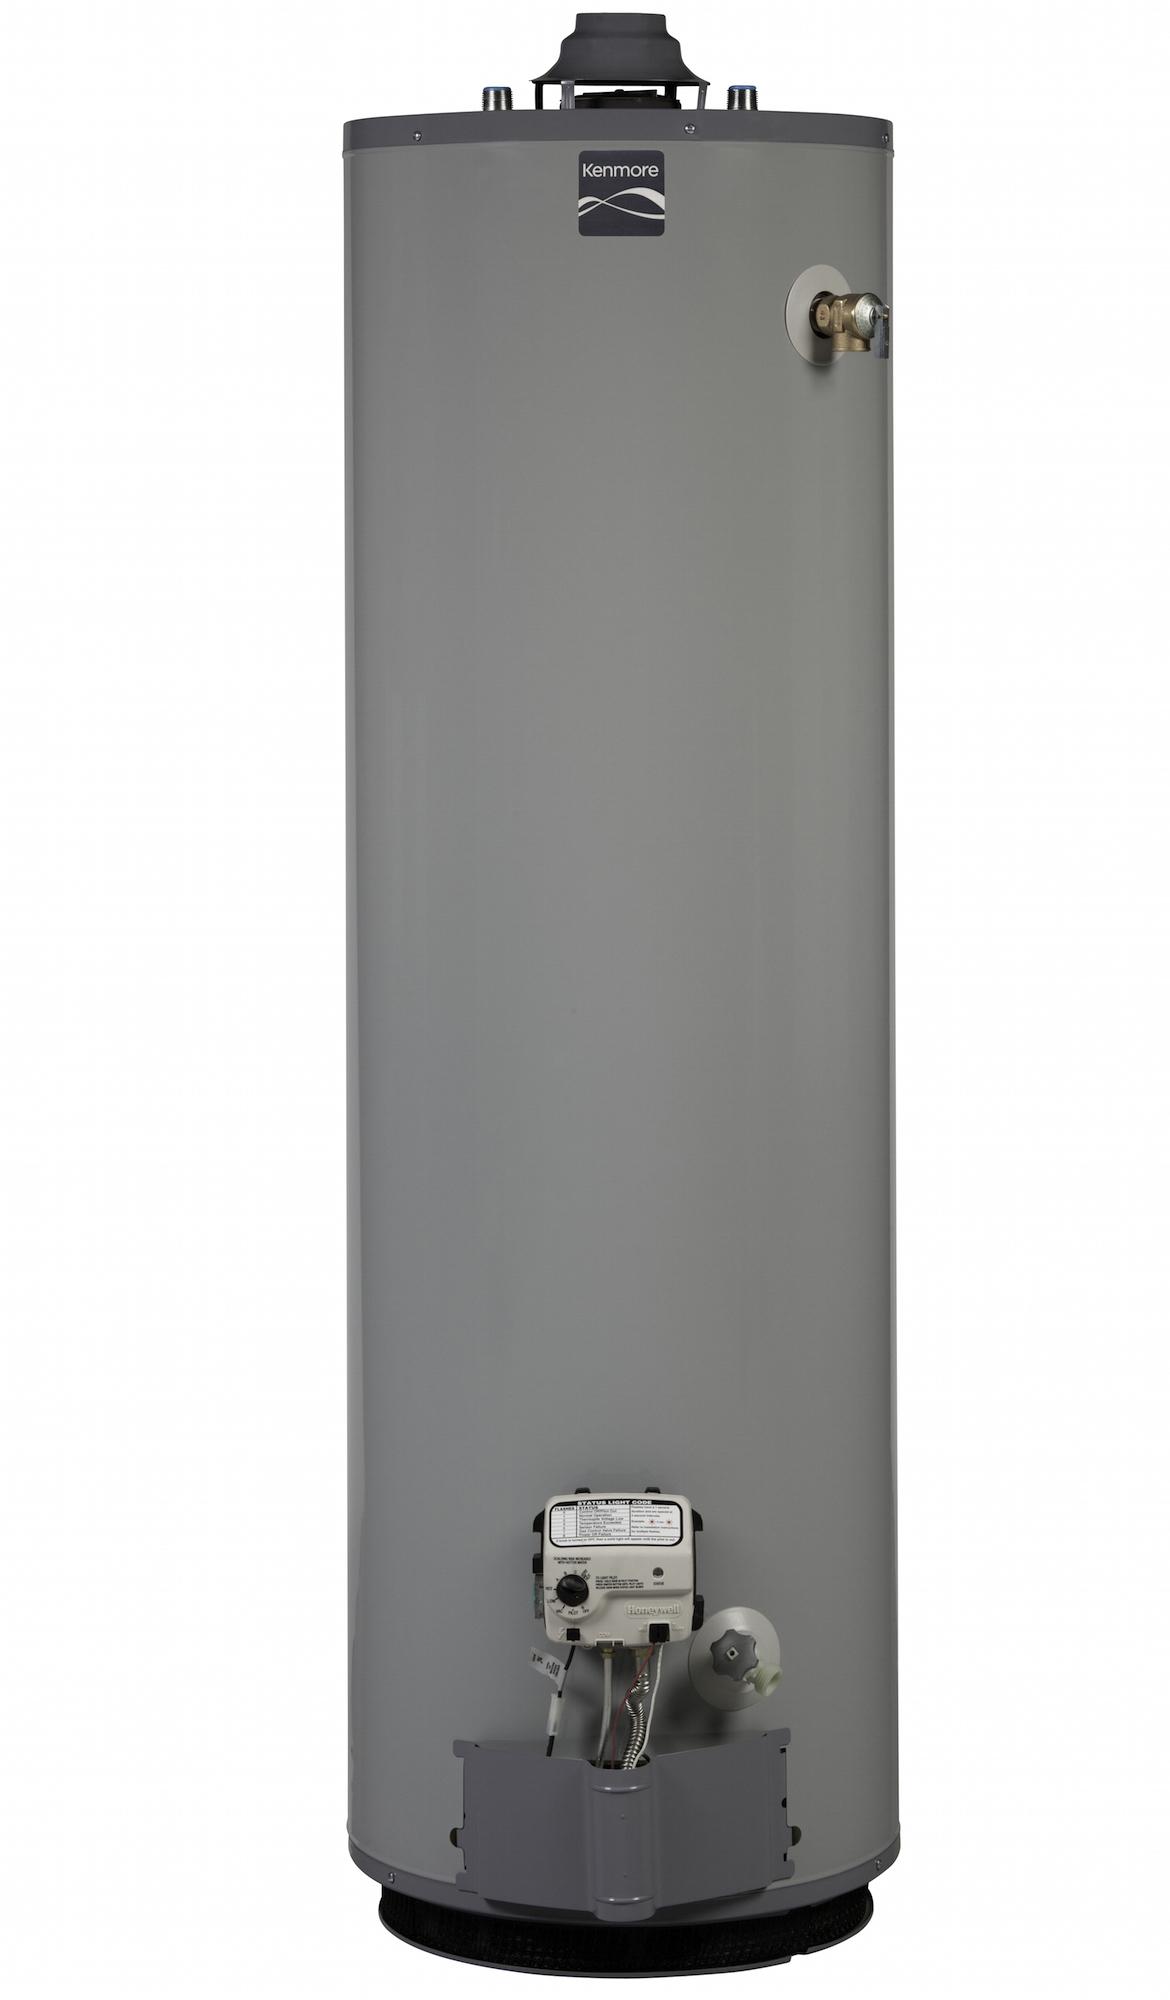 Kenmore 57942 40 gal. 9-Year Tall Liquid Propane Water Heater